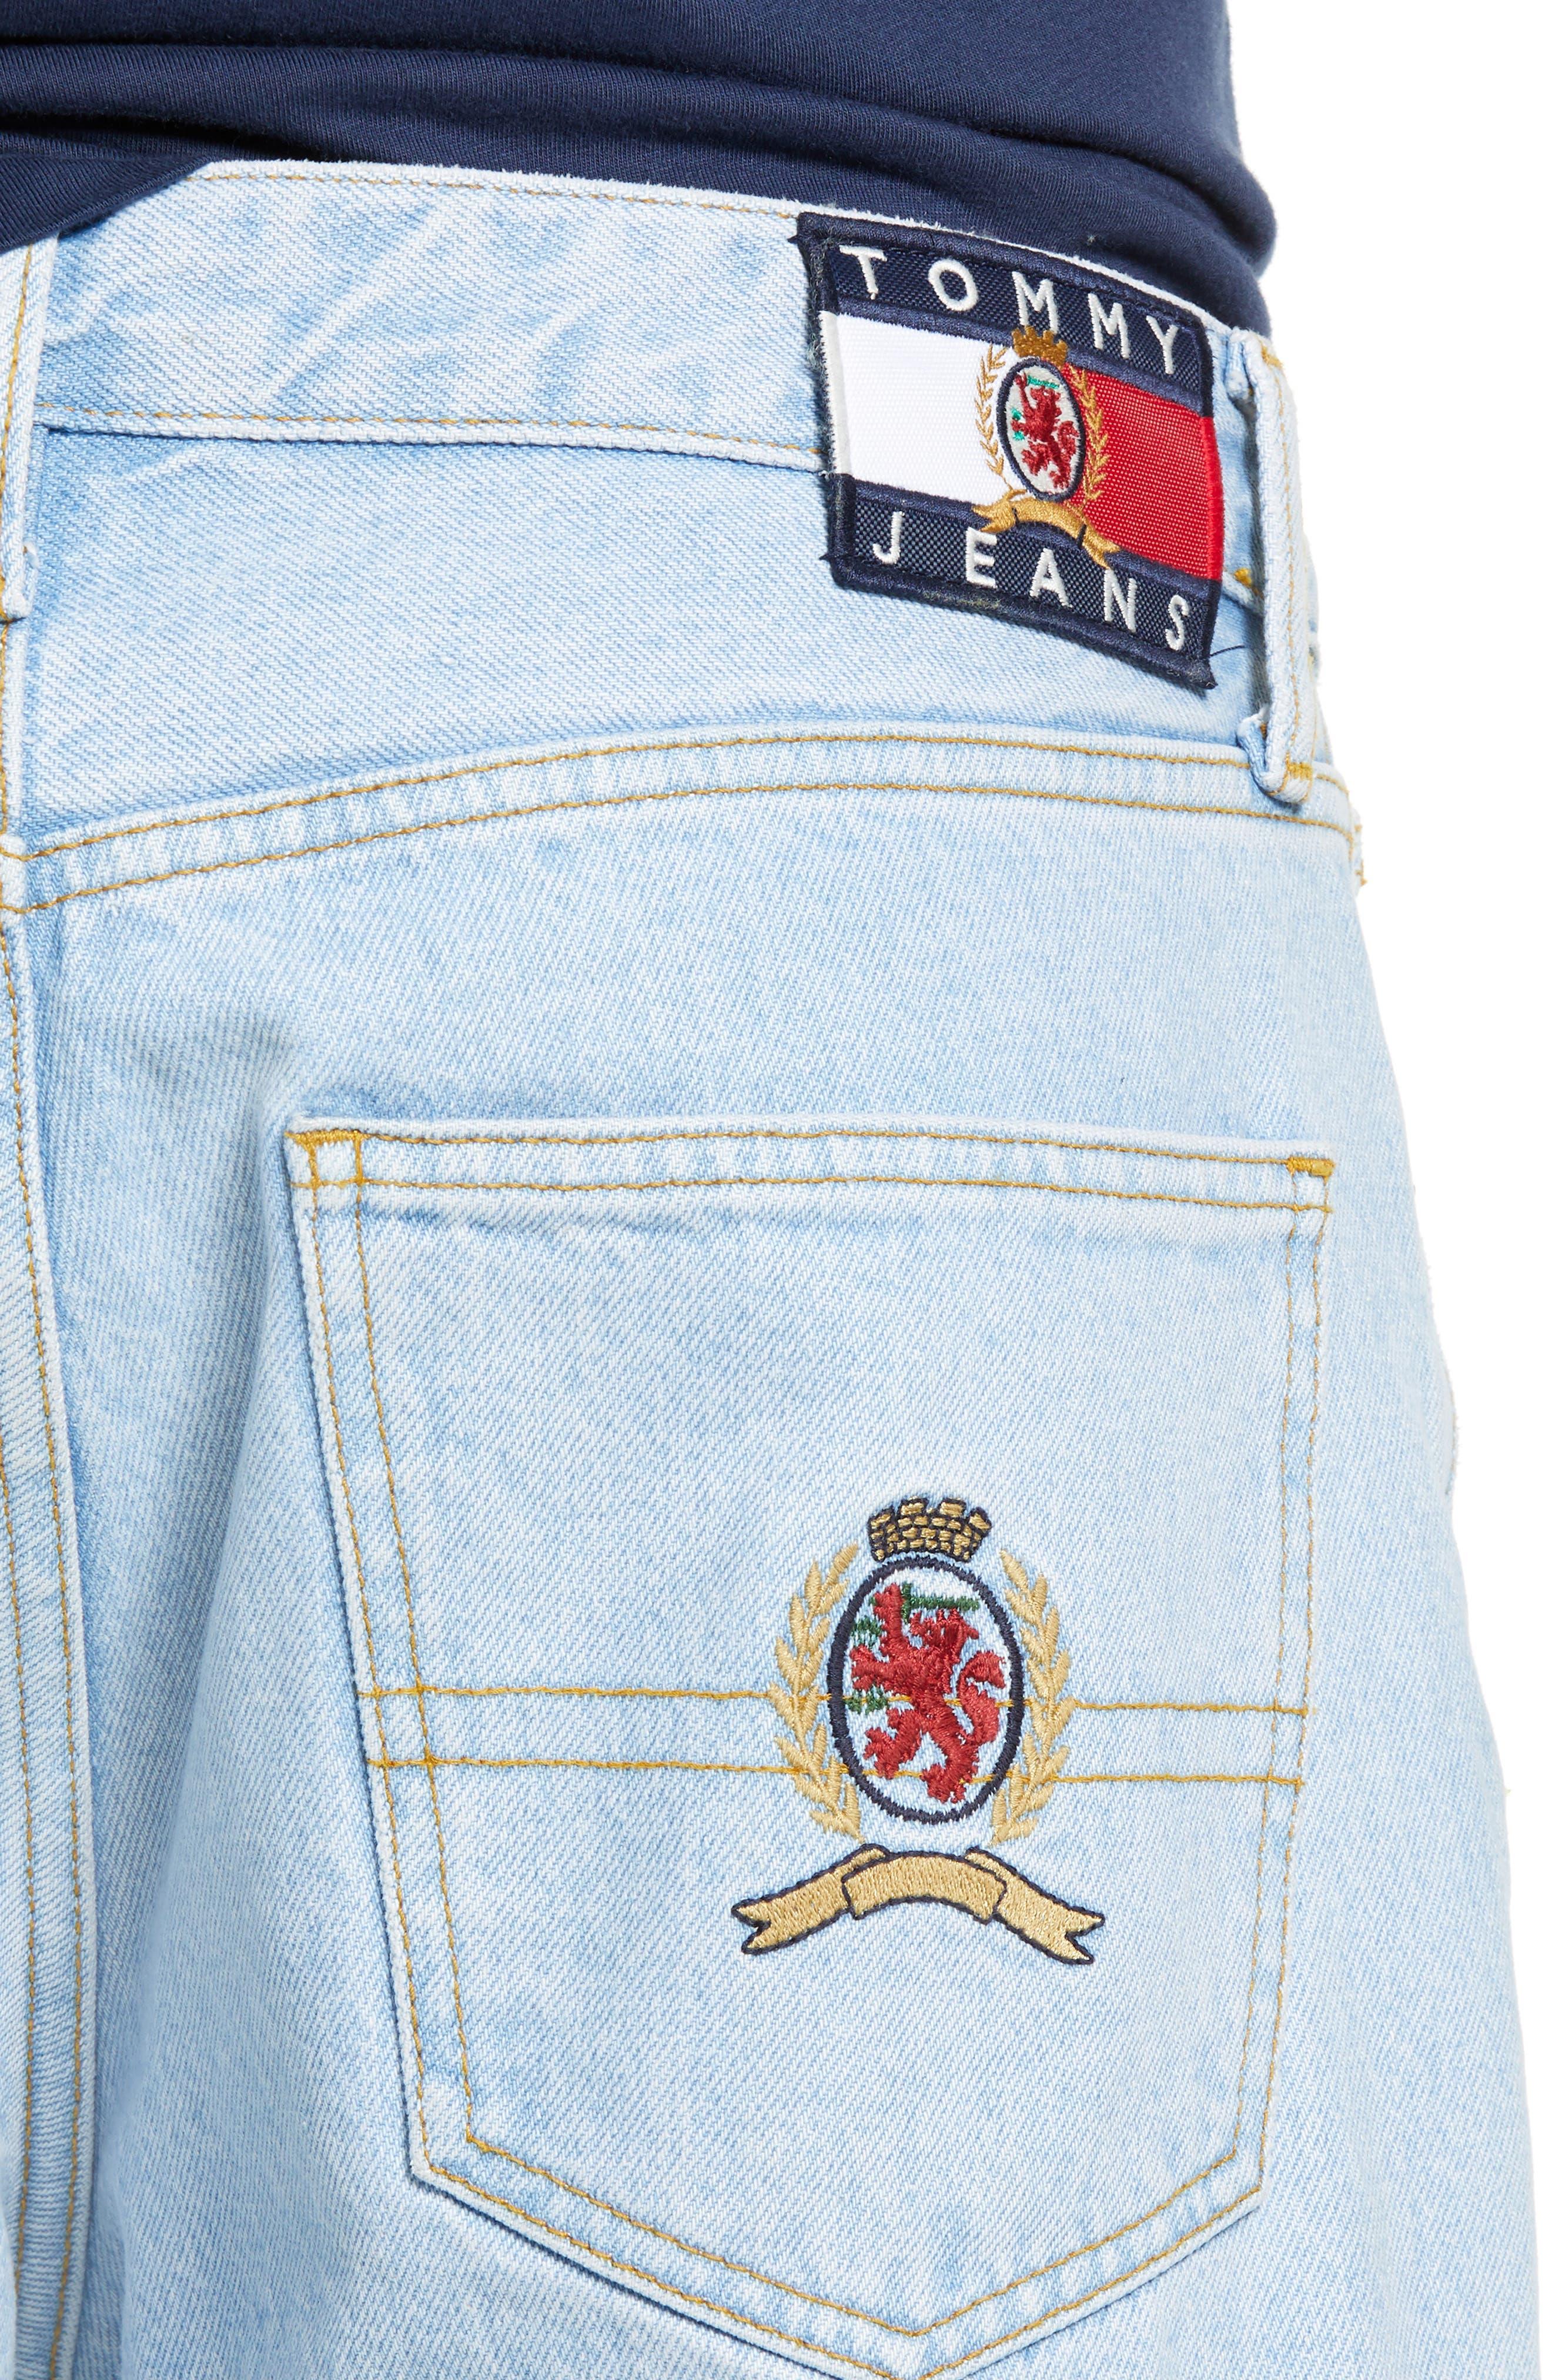 Crest Straight Leg Dad Jeans,                             Alternate thumbnail 4, color,                             LIGHT BLUE DENIM